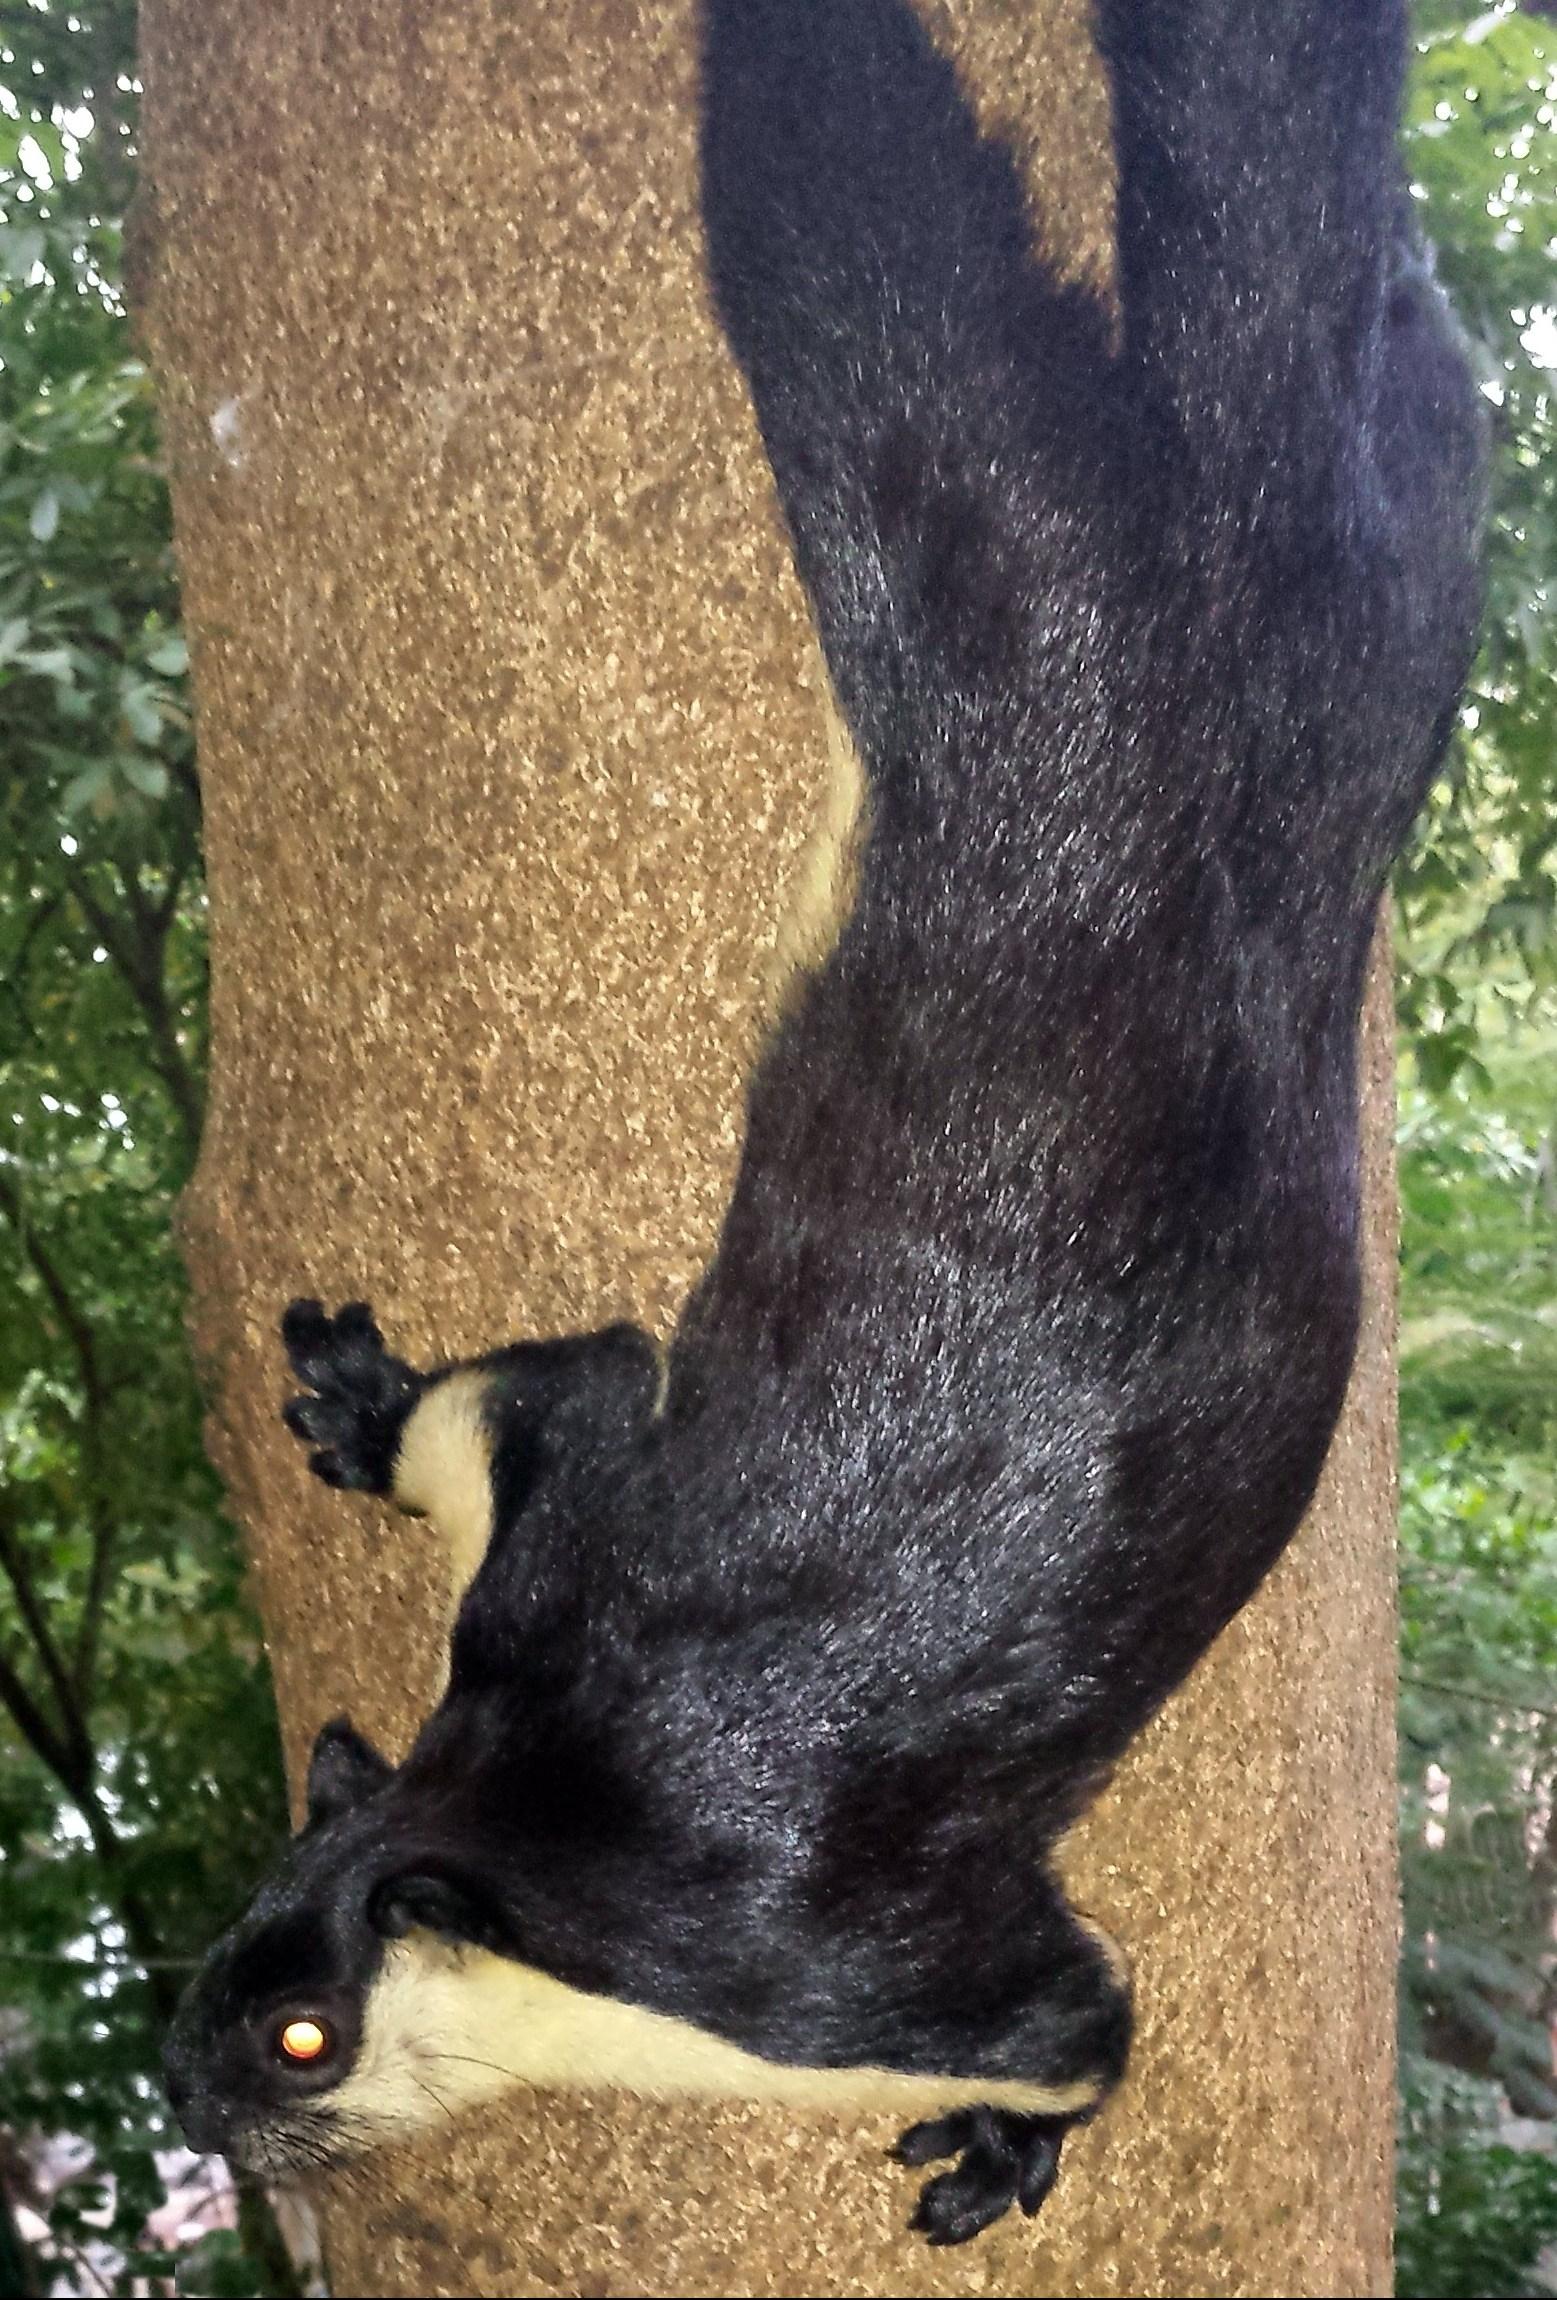 World's largest squirrel